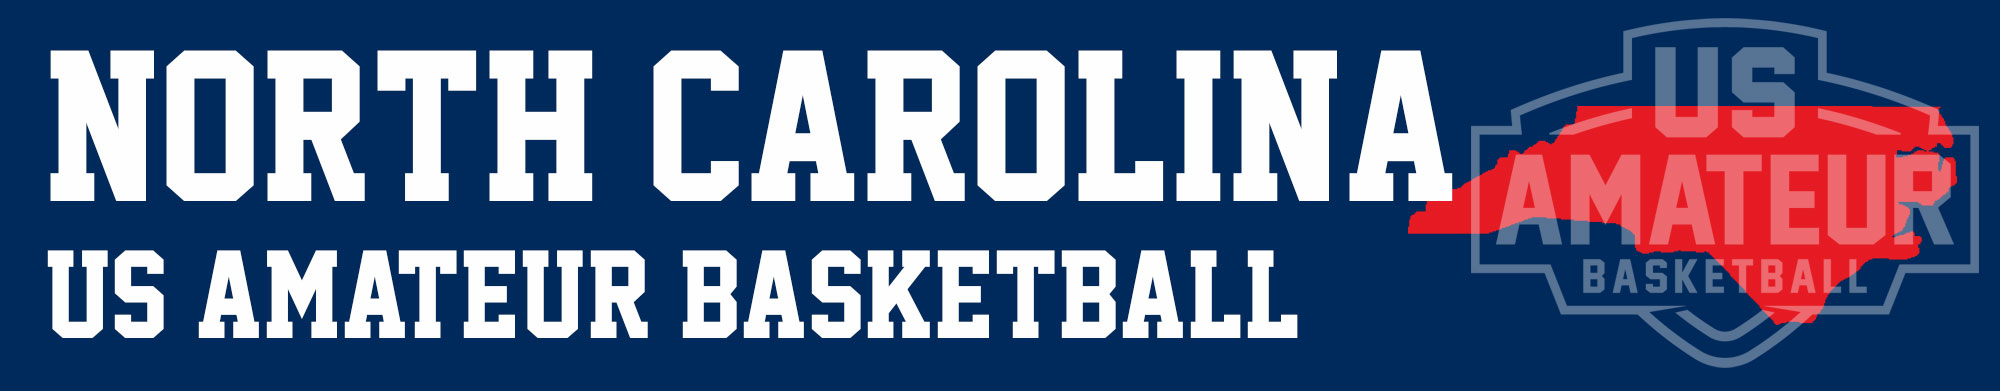 North Carolina US Amateur Basketball